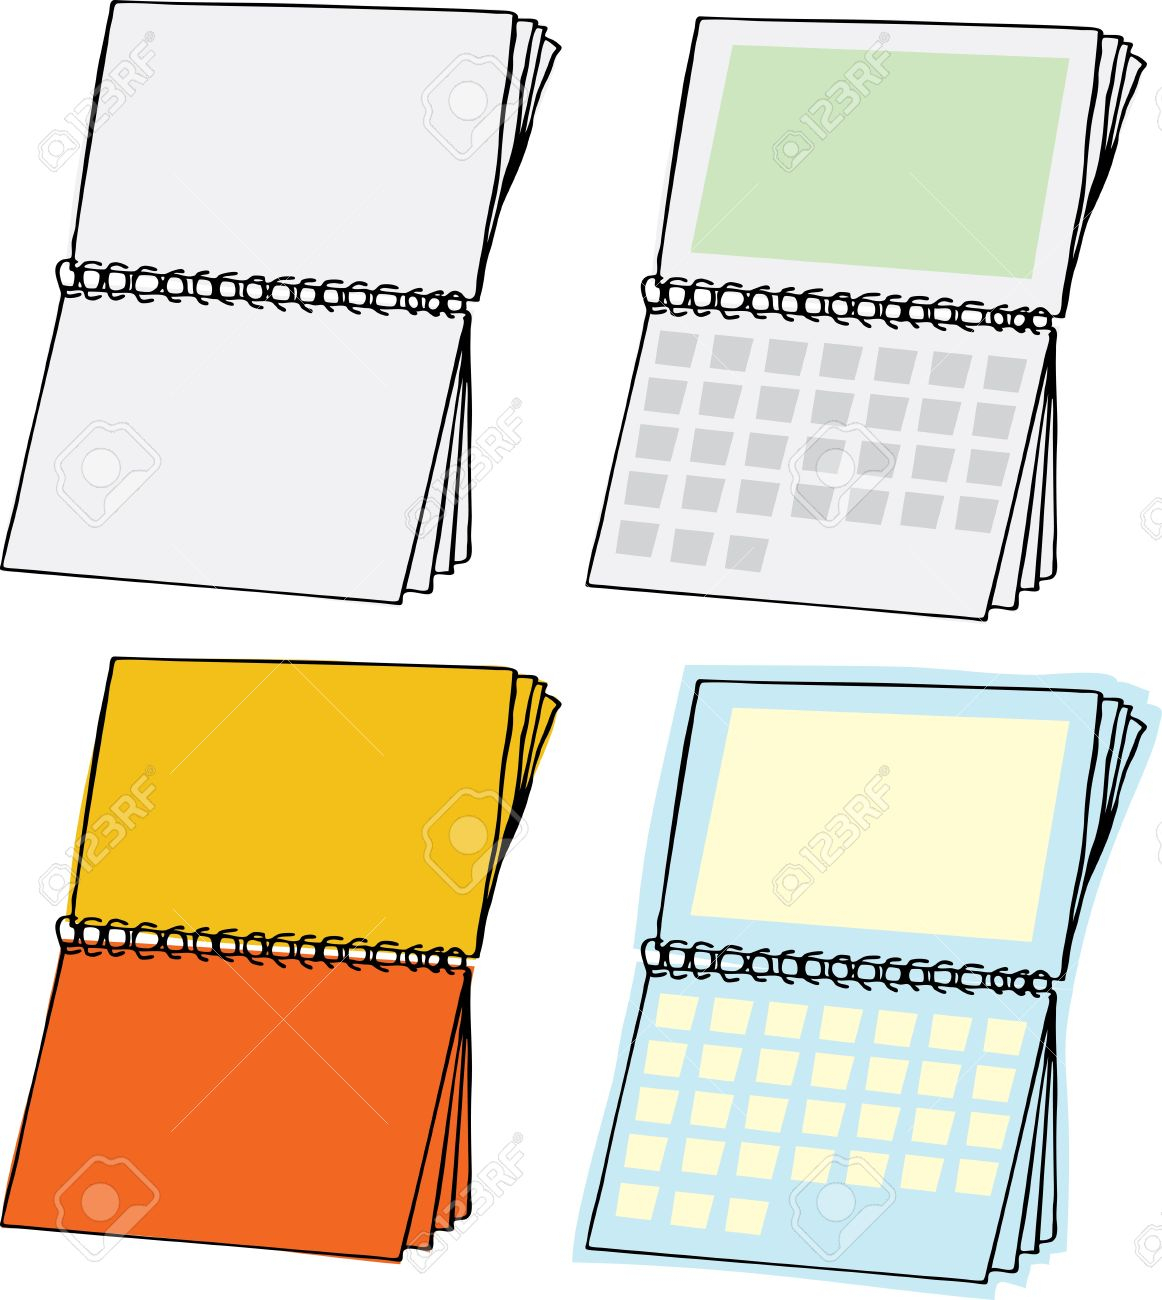 Four Types Of Blank Spiral Bound Calendars